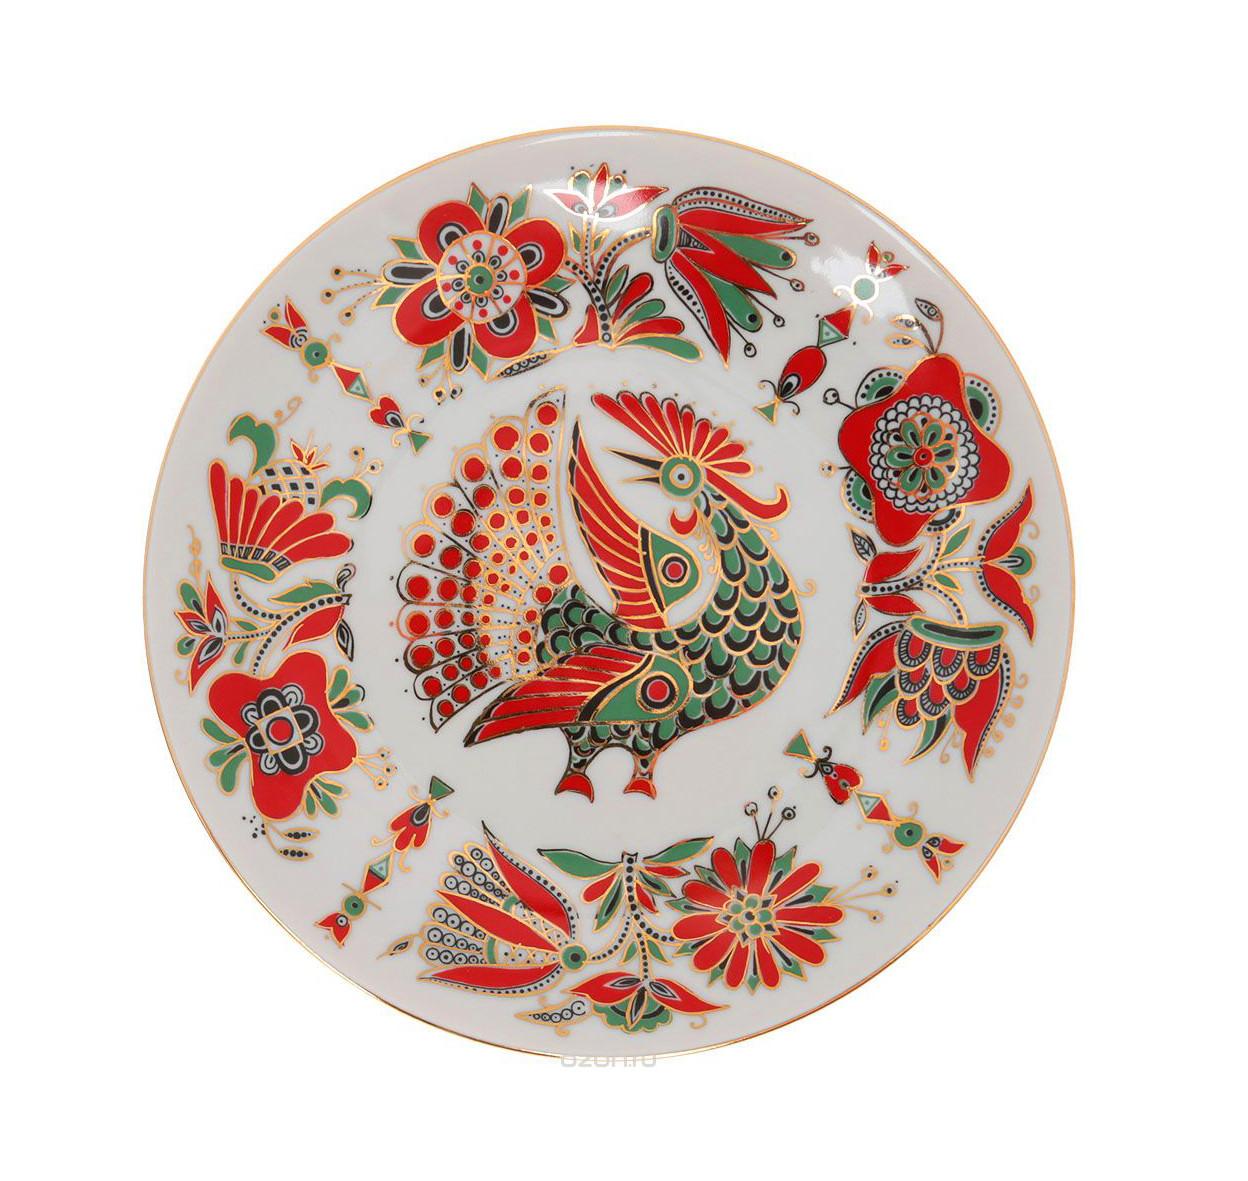 Тарелка декоративная Красная птица. Императорский фарфор